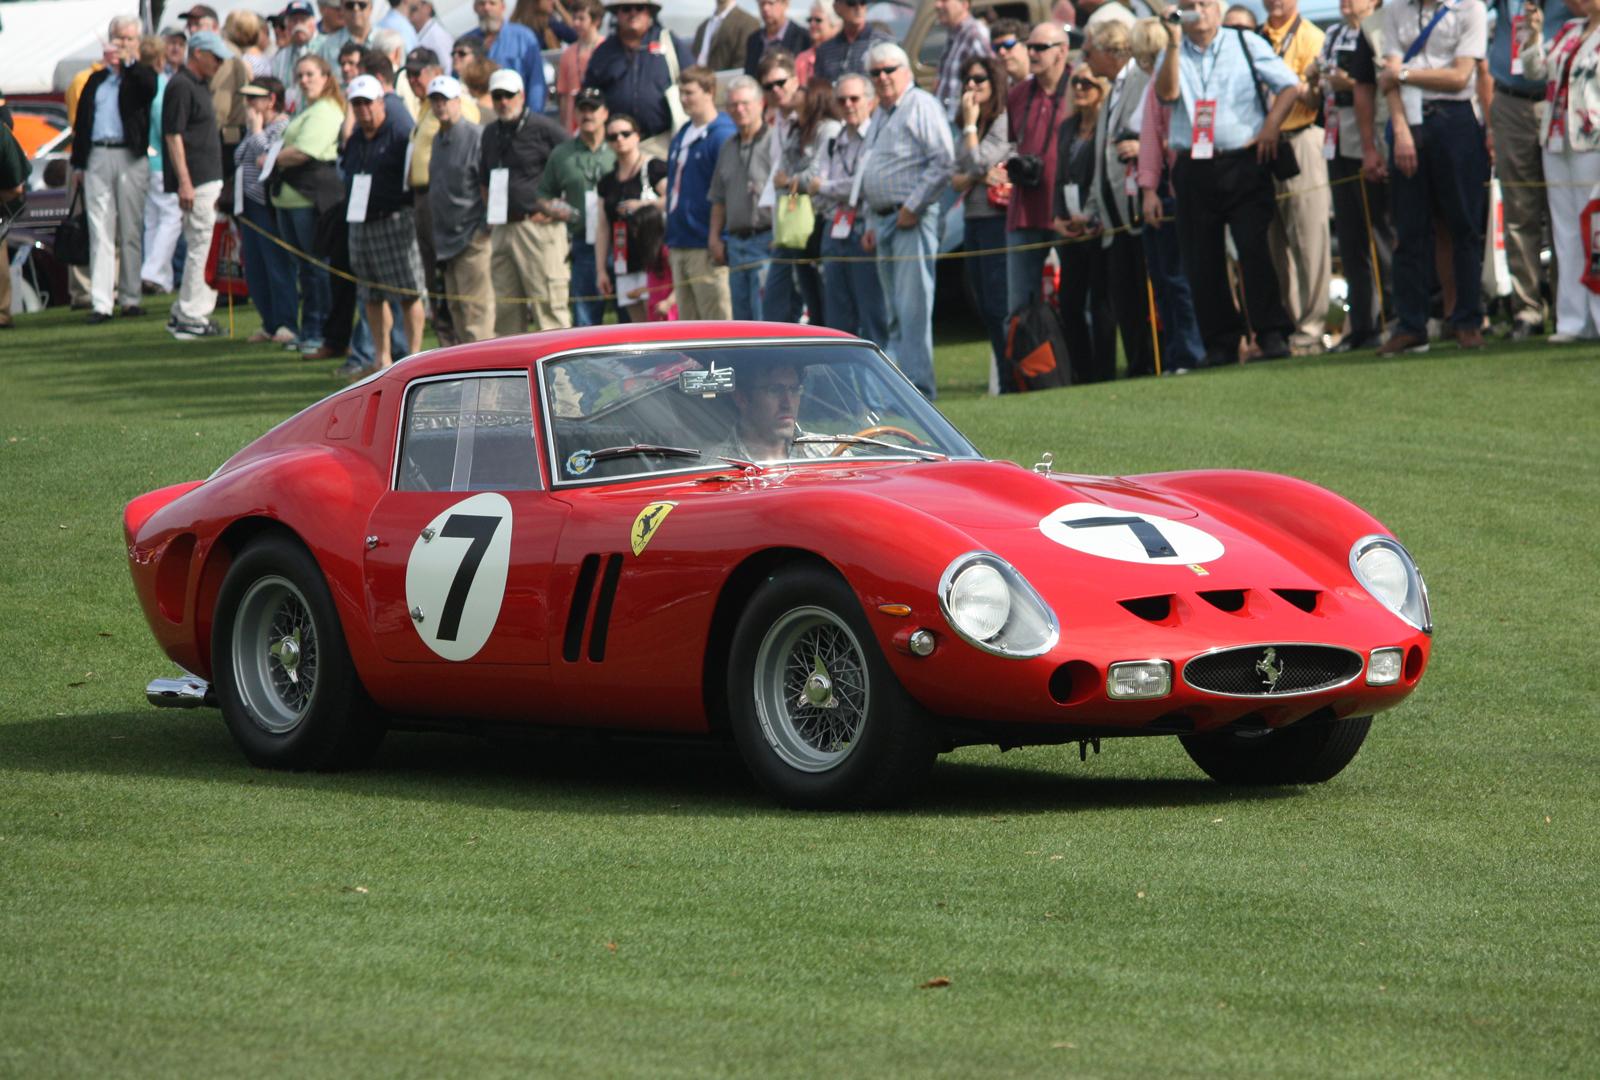 1963 Ferrari 330 Lm Wins Concours De Sport At Amelia Island